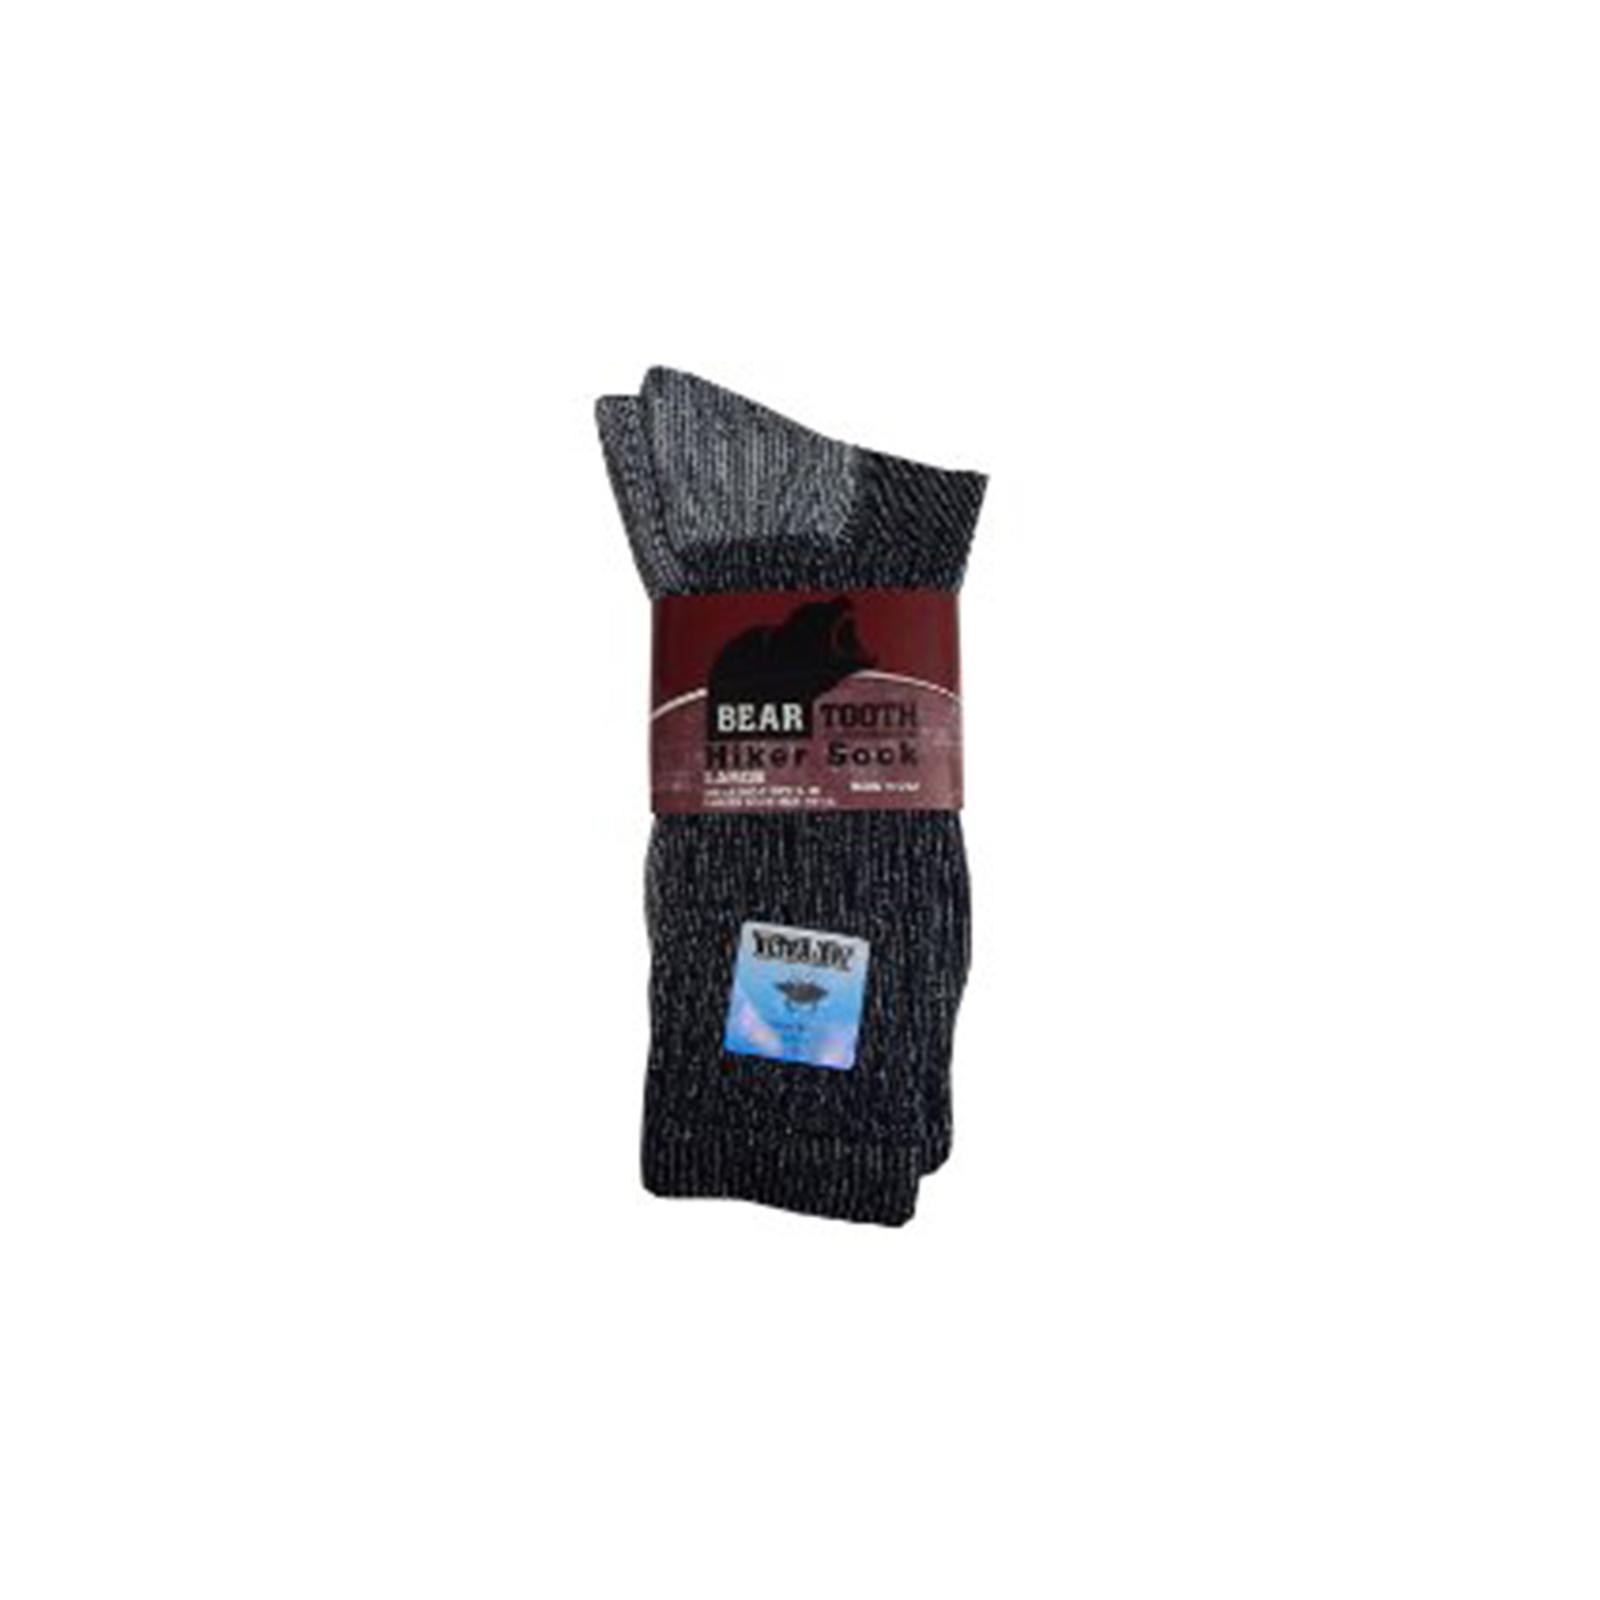 Bear Tooth 9052 Men's Dry Hiker Sock Large Black